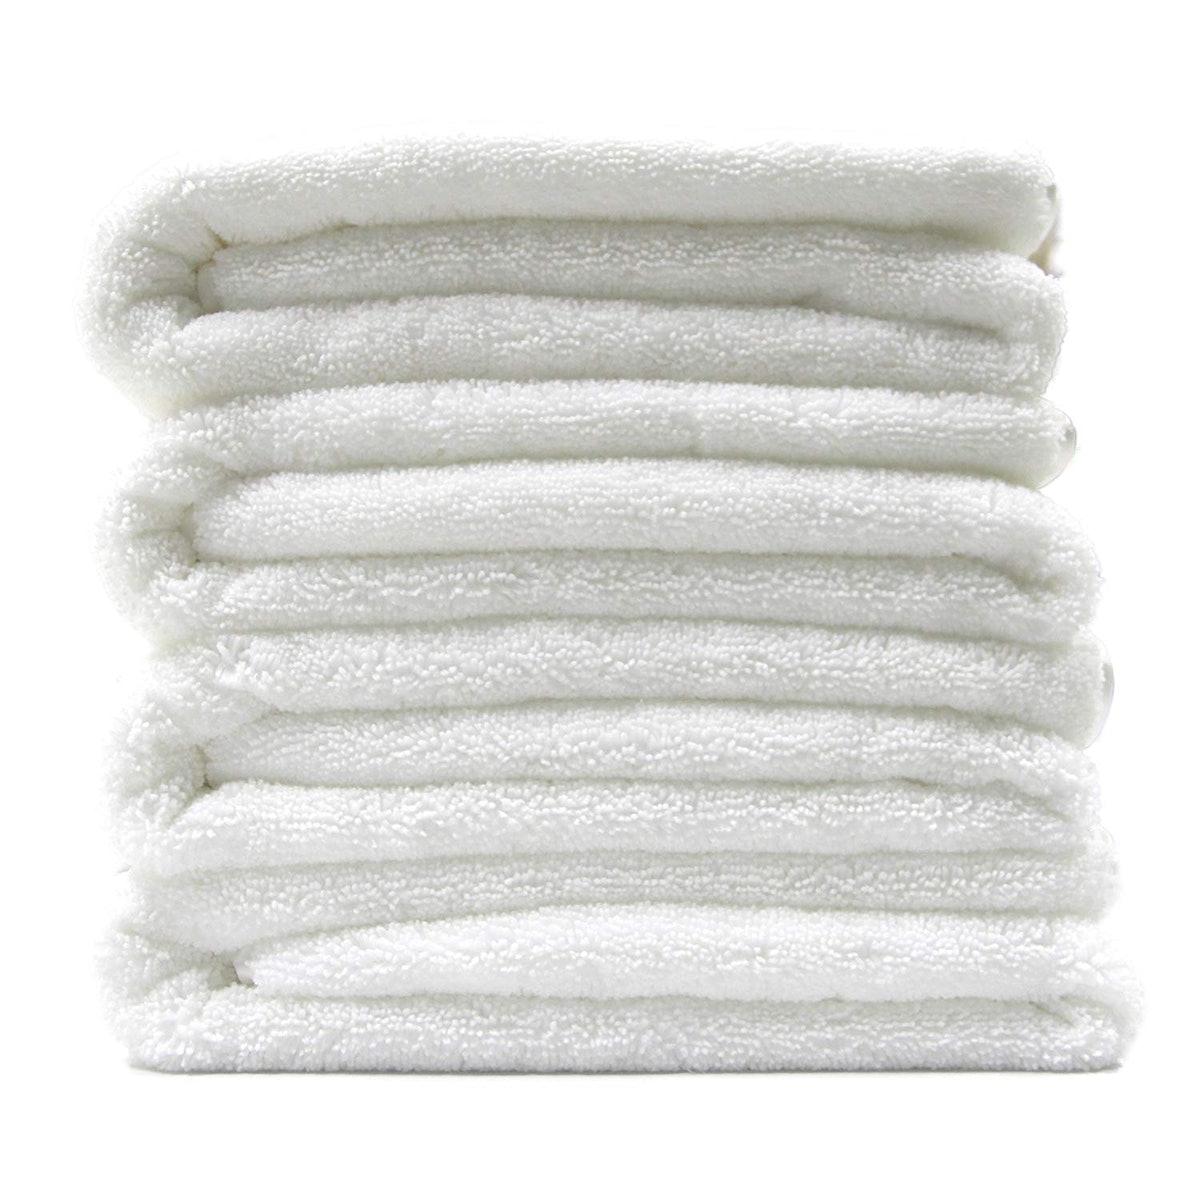 Polyte Quick Dry Microfiber Bath Towel, 4-Piece Set